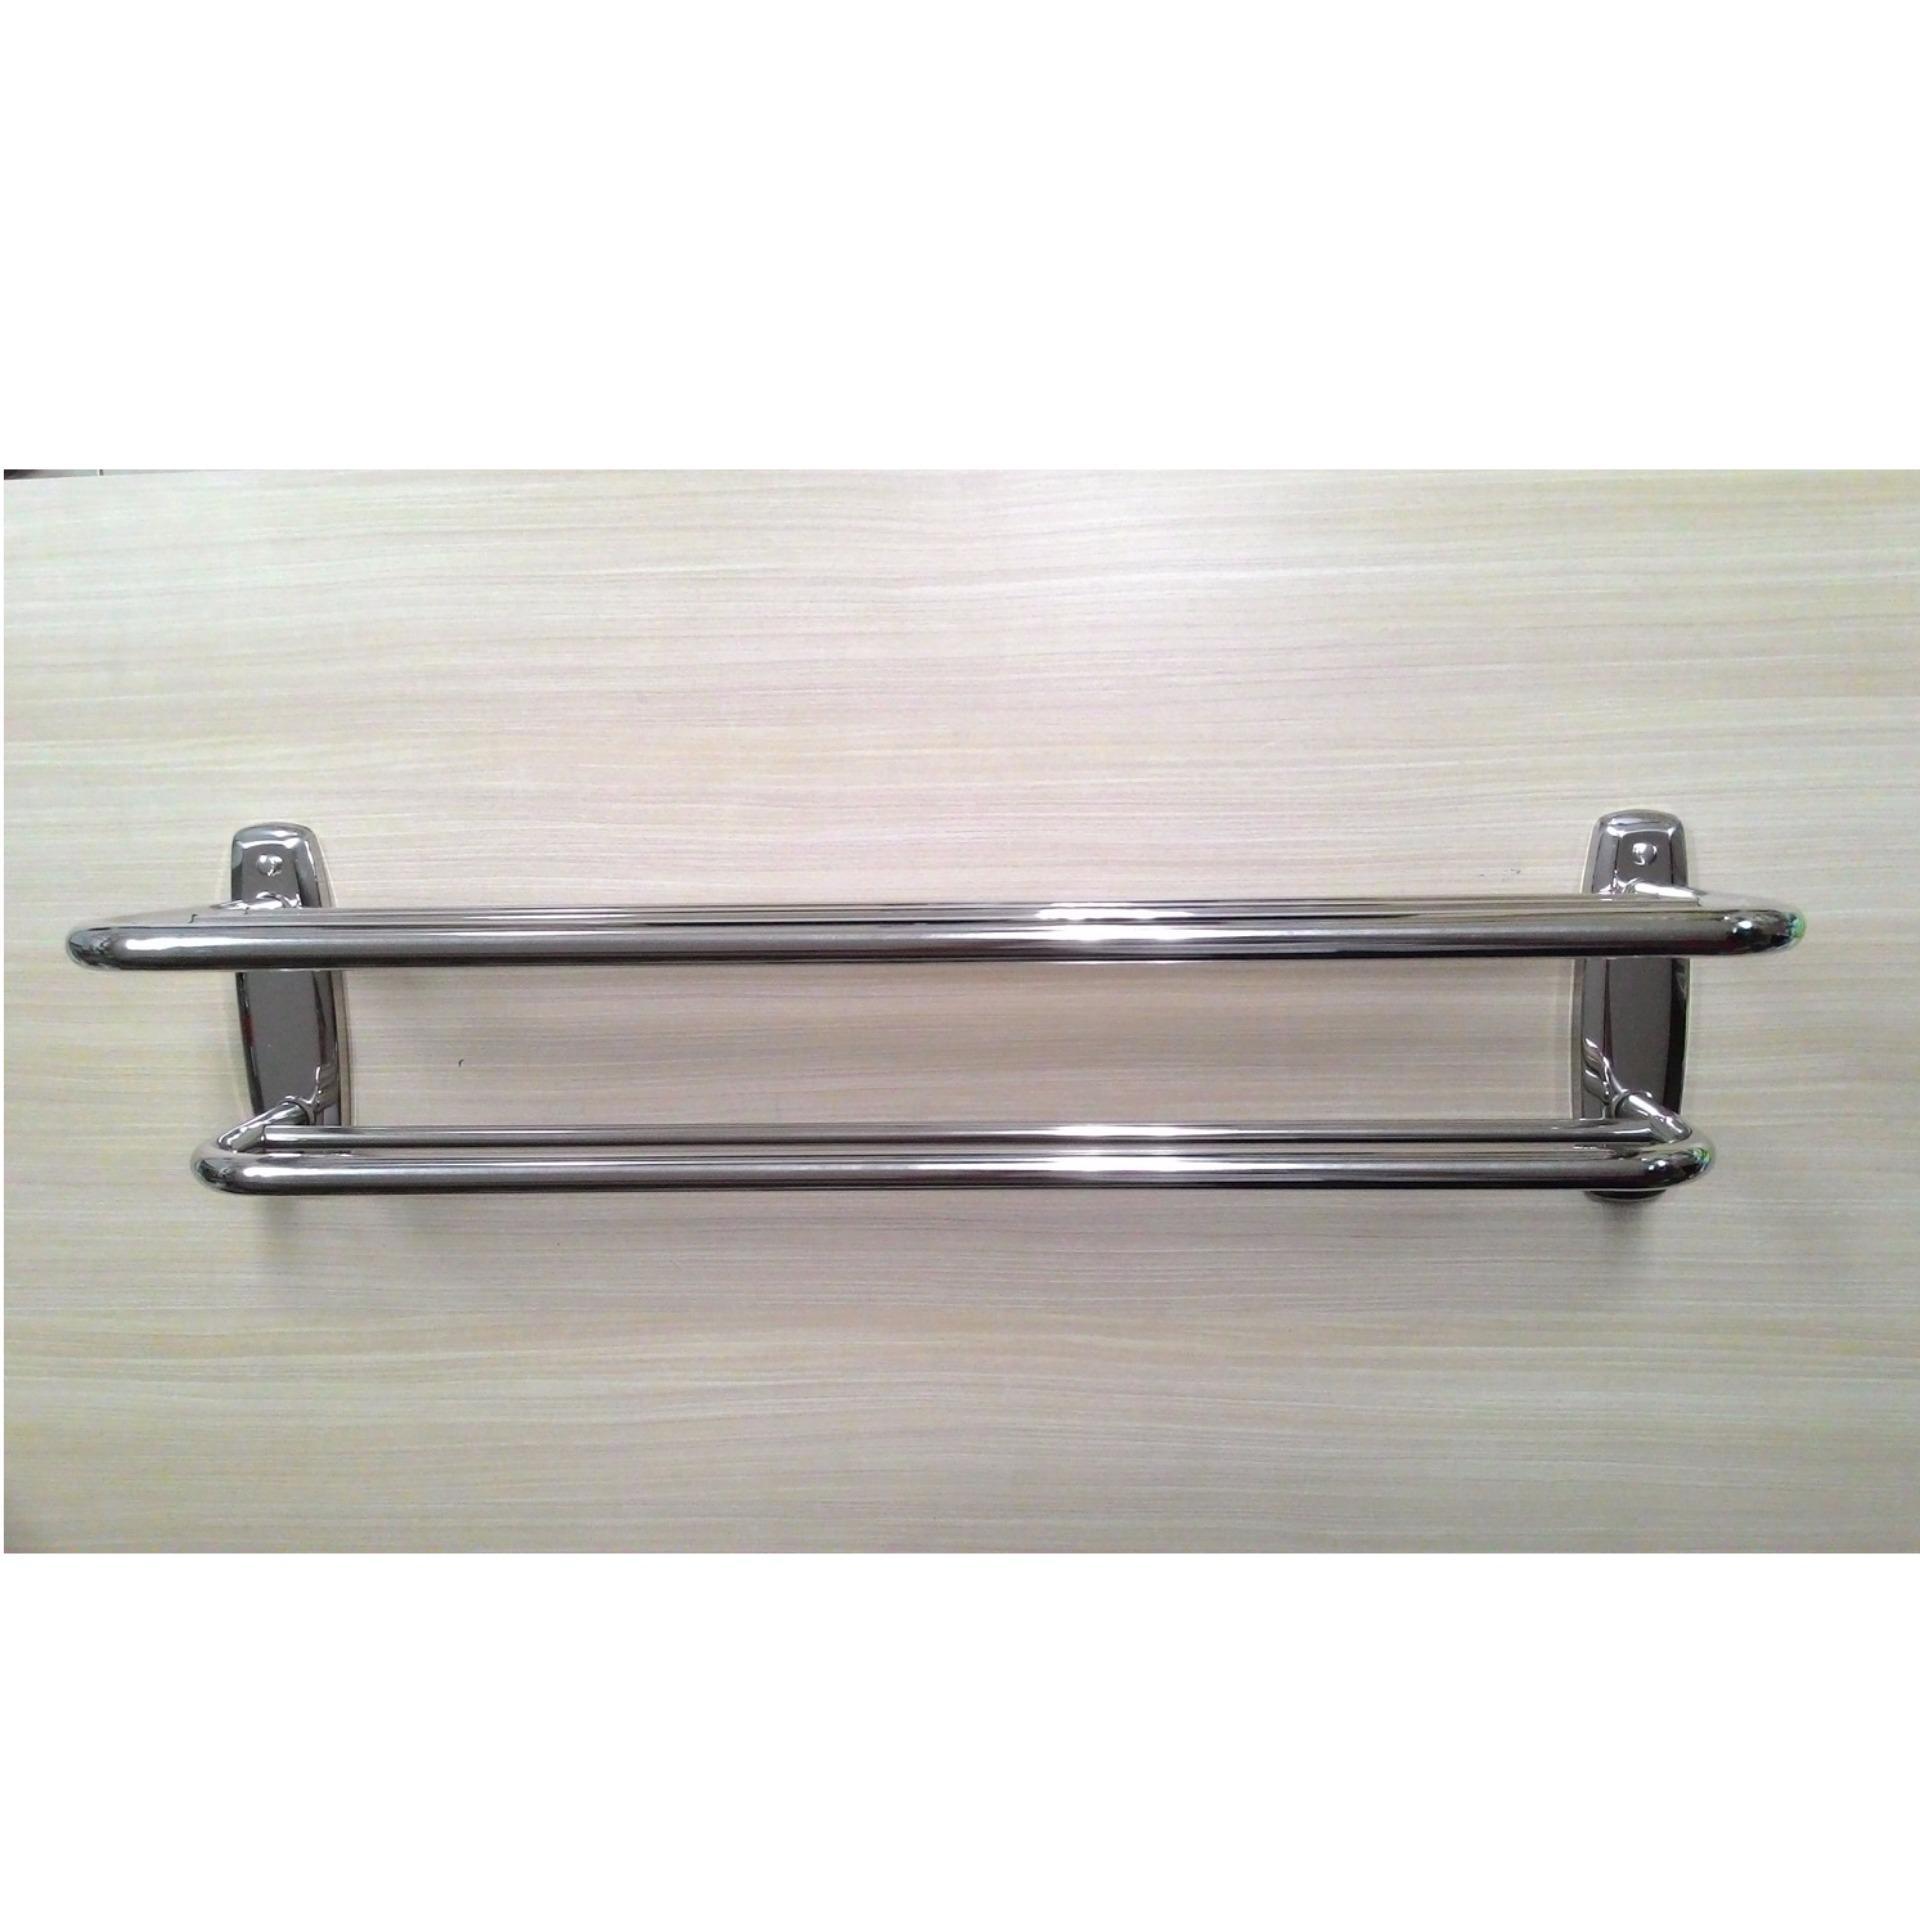 Premium Rak Dinding Handuk Aluminium Toilet Kamar Mandi Elegan Serbaguna 3 Susun Multifungsi Source Sloof Wc